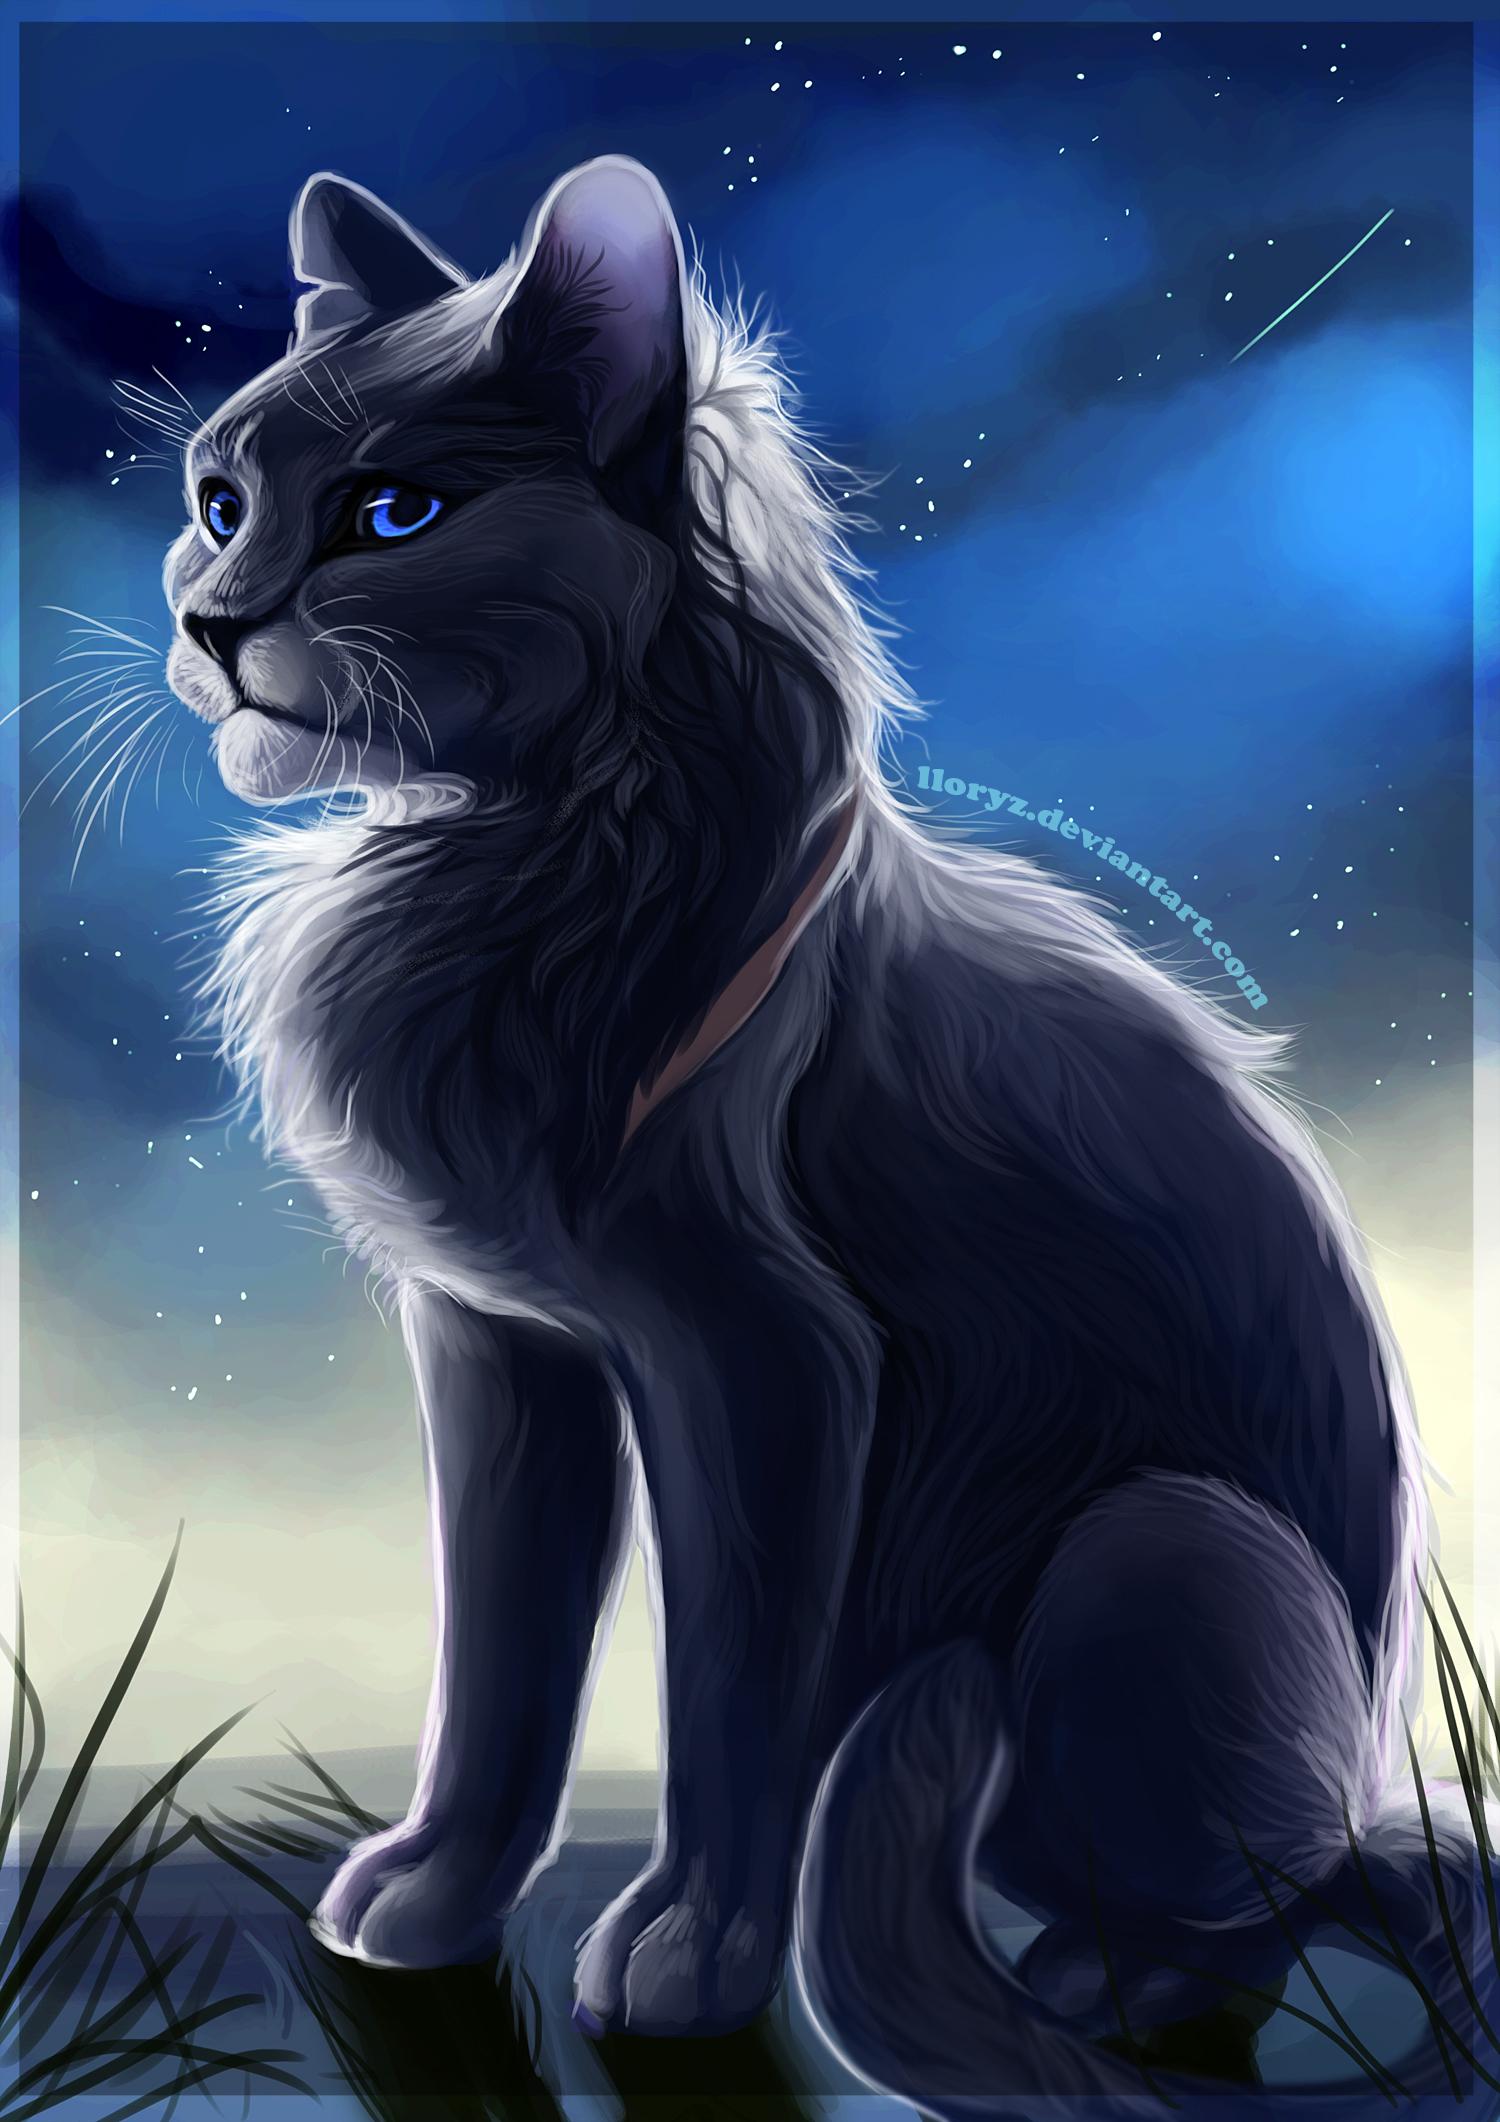 Bluestar by LLoryZ on DeviantArt Warrior Cat Drawings Bluestar